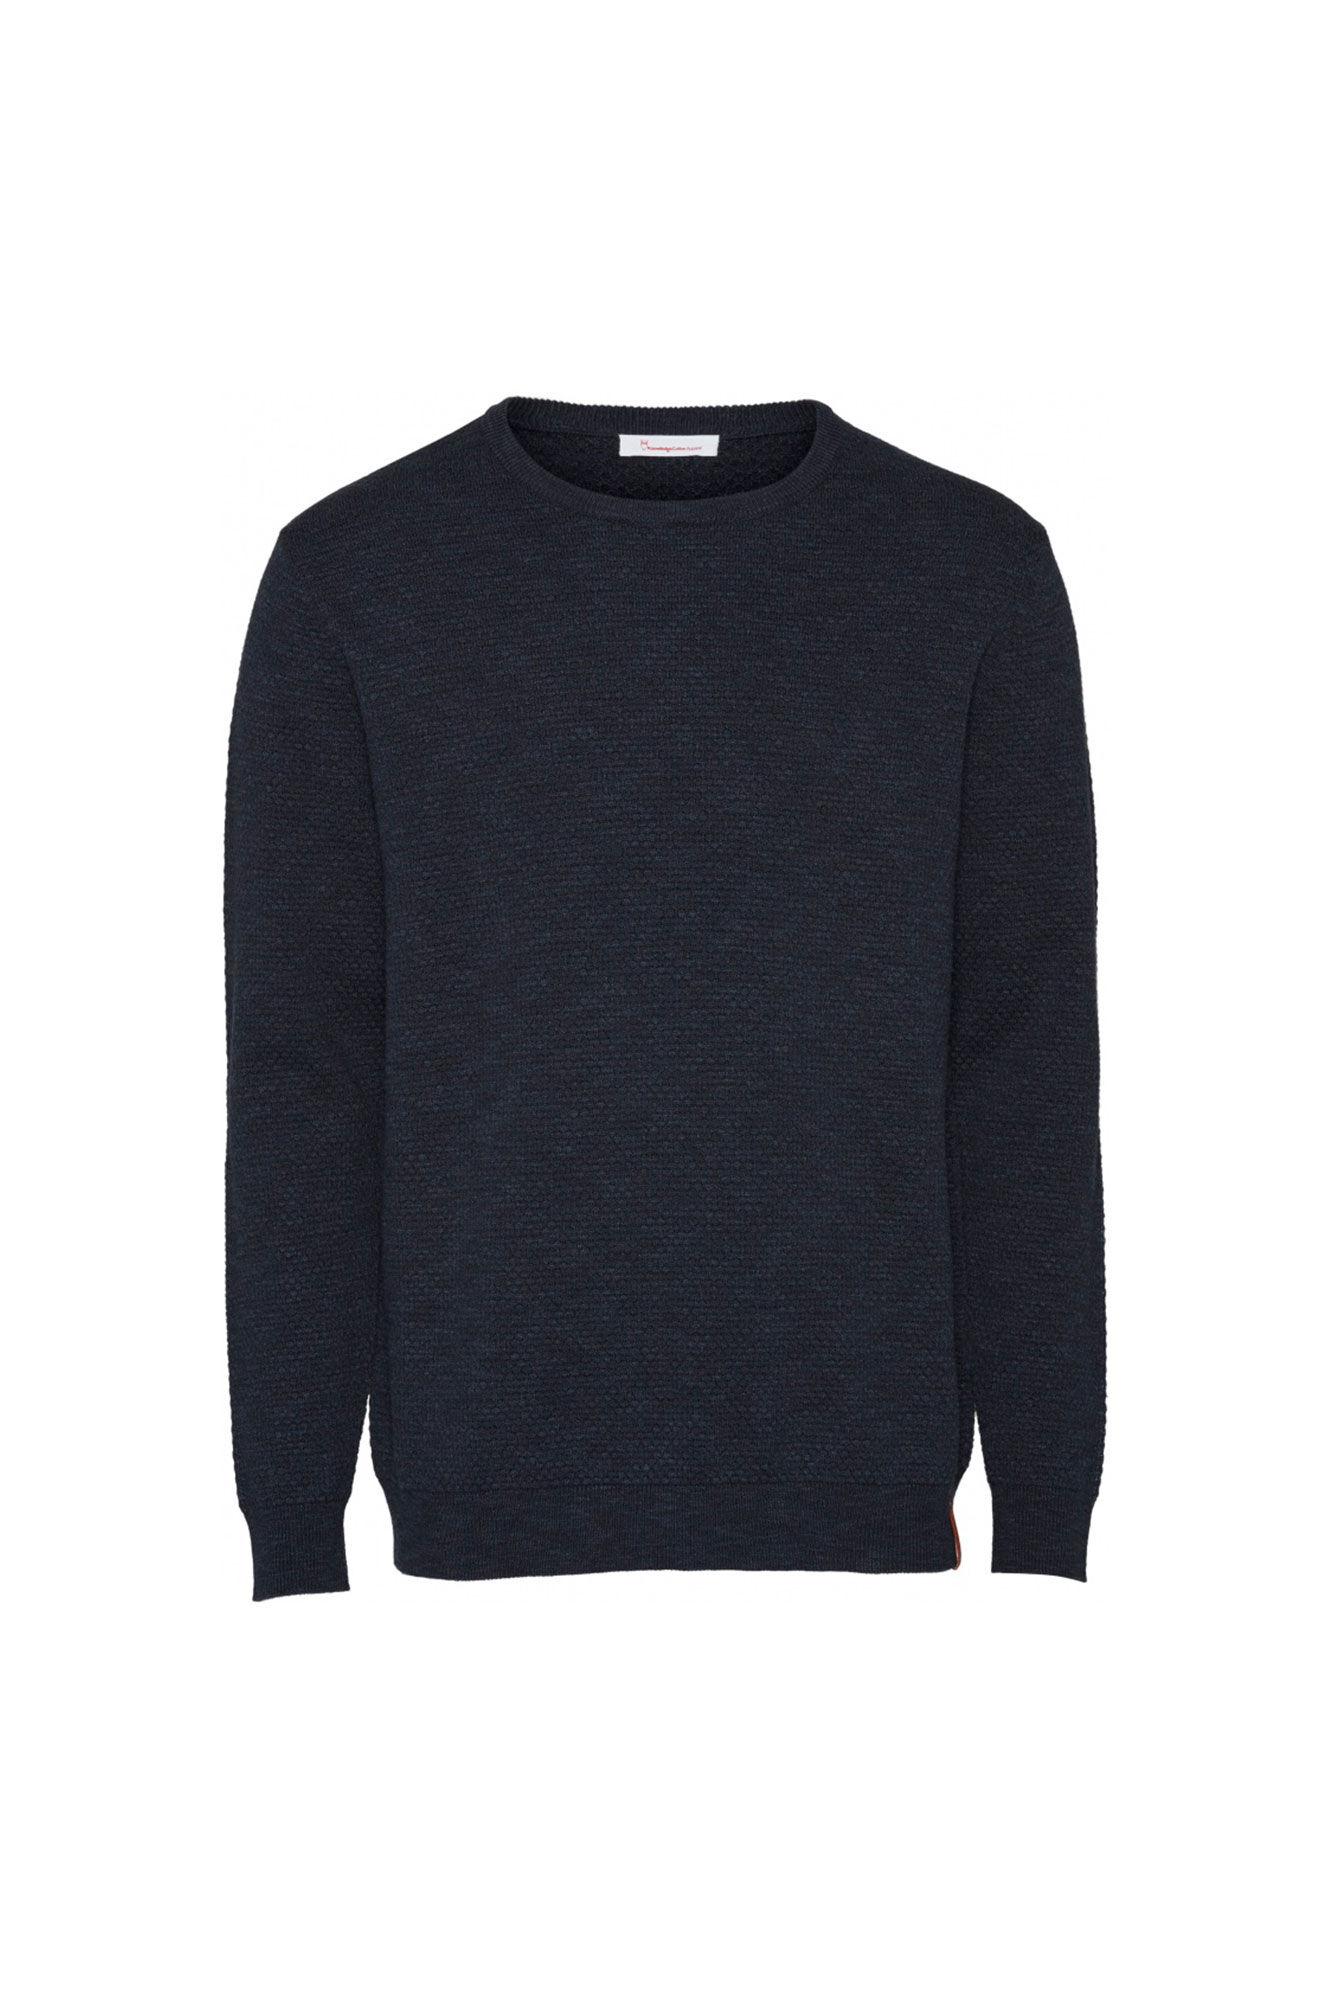 Bobble knit crew-neck 80563